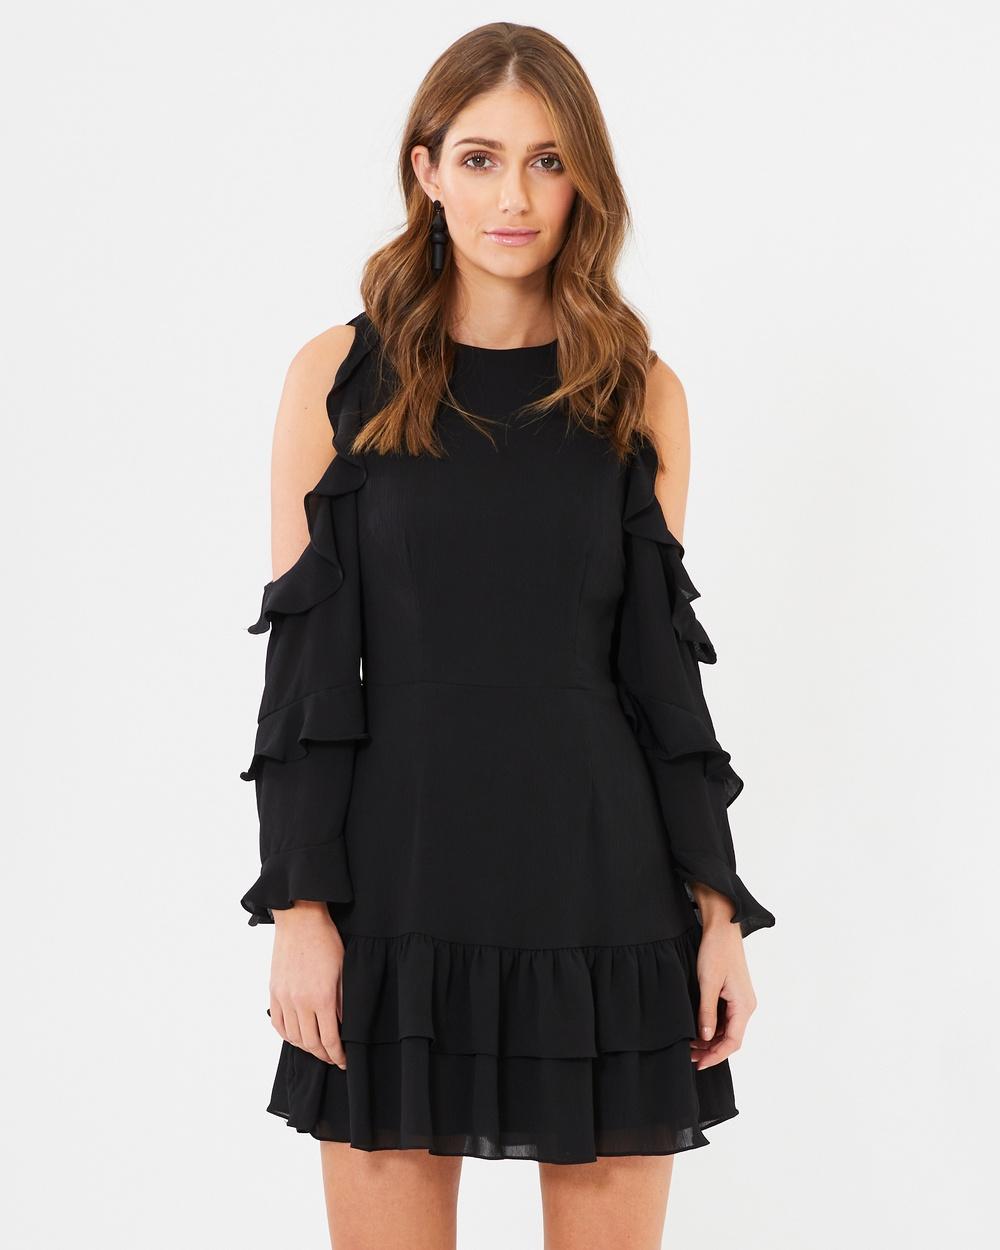 CHANCERY Courtney Frill Mini Dress Dresses Black Courtney Frill Mini Dress